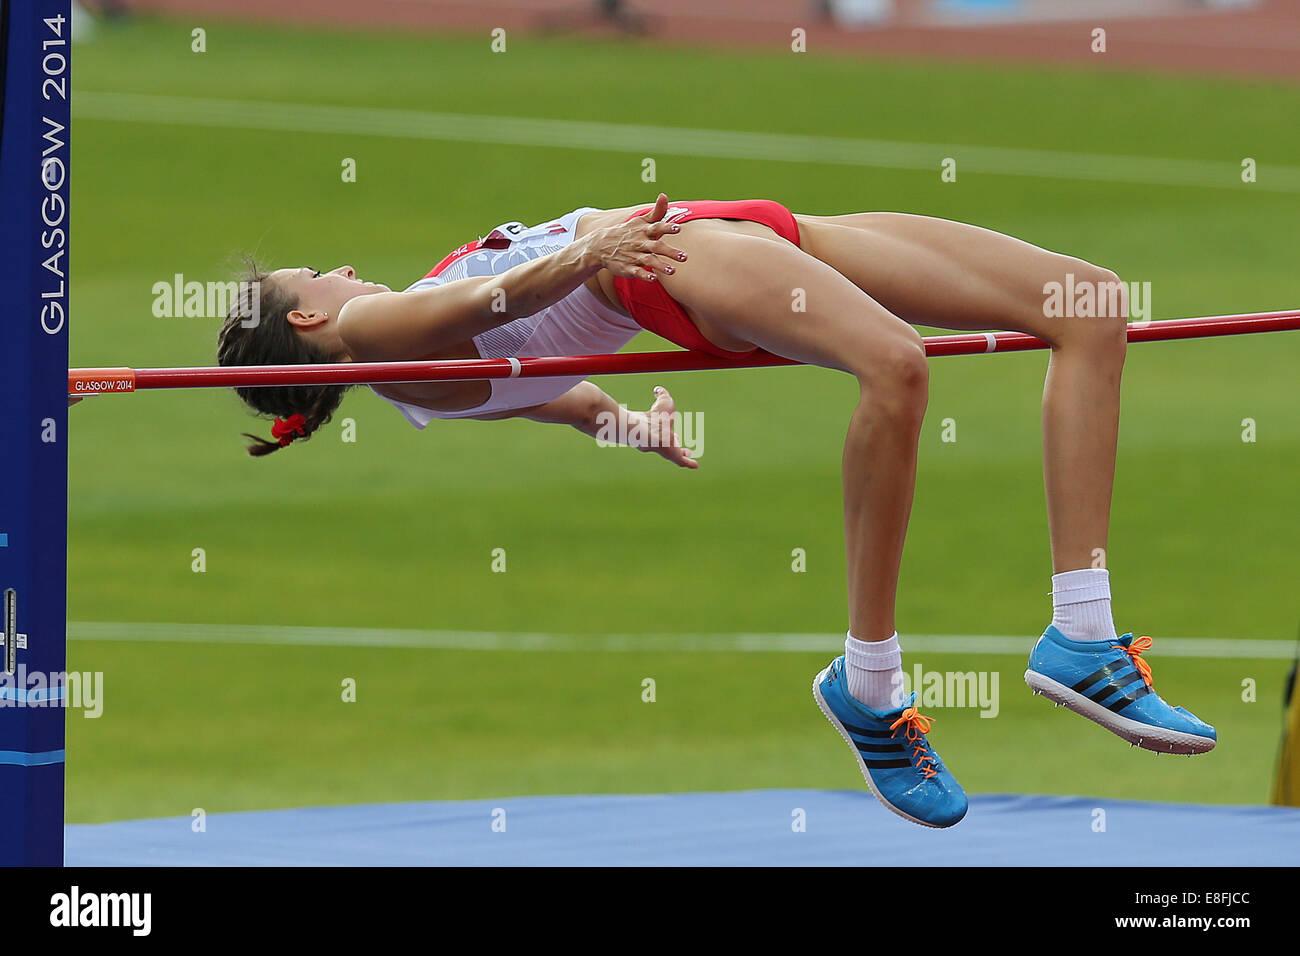 Isobel Pooley (ENG) wins the Silver Medal - Womens High Jump Final. Athletics - Hampden Park - Glasgow - UK - 01/08/2014 - Stock Image